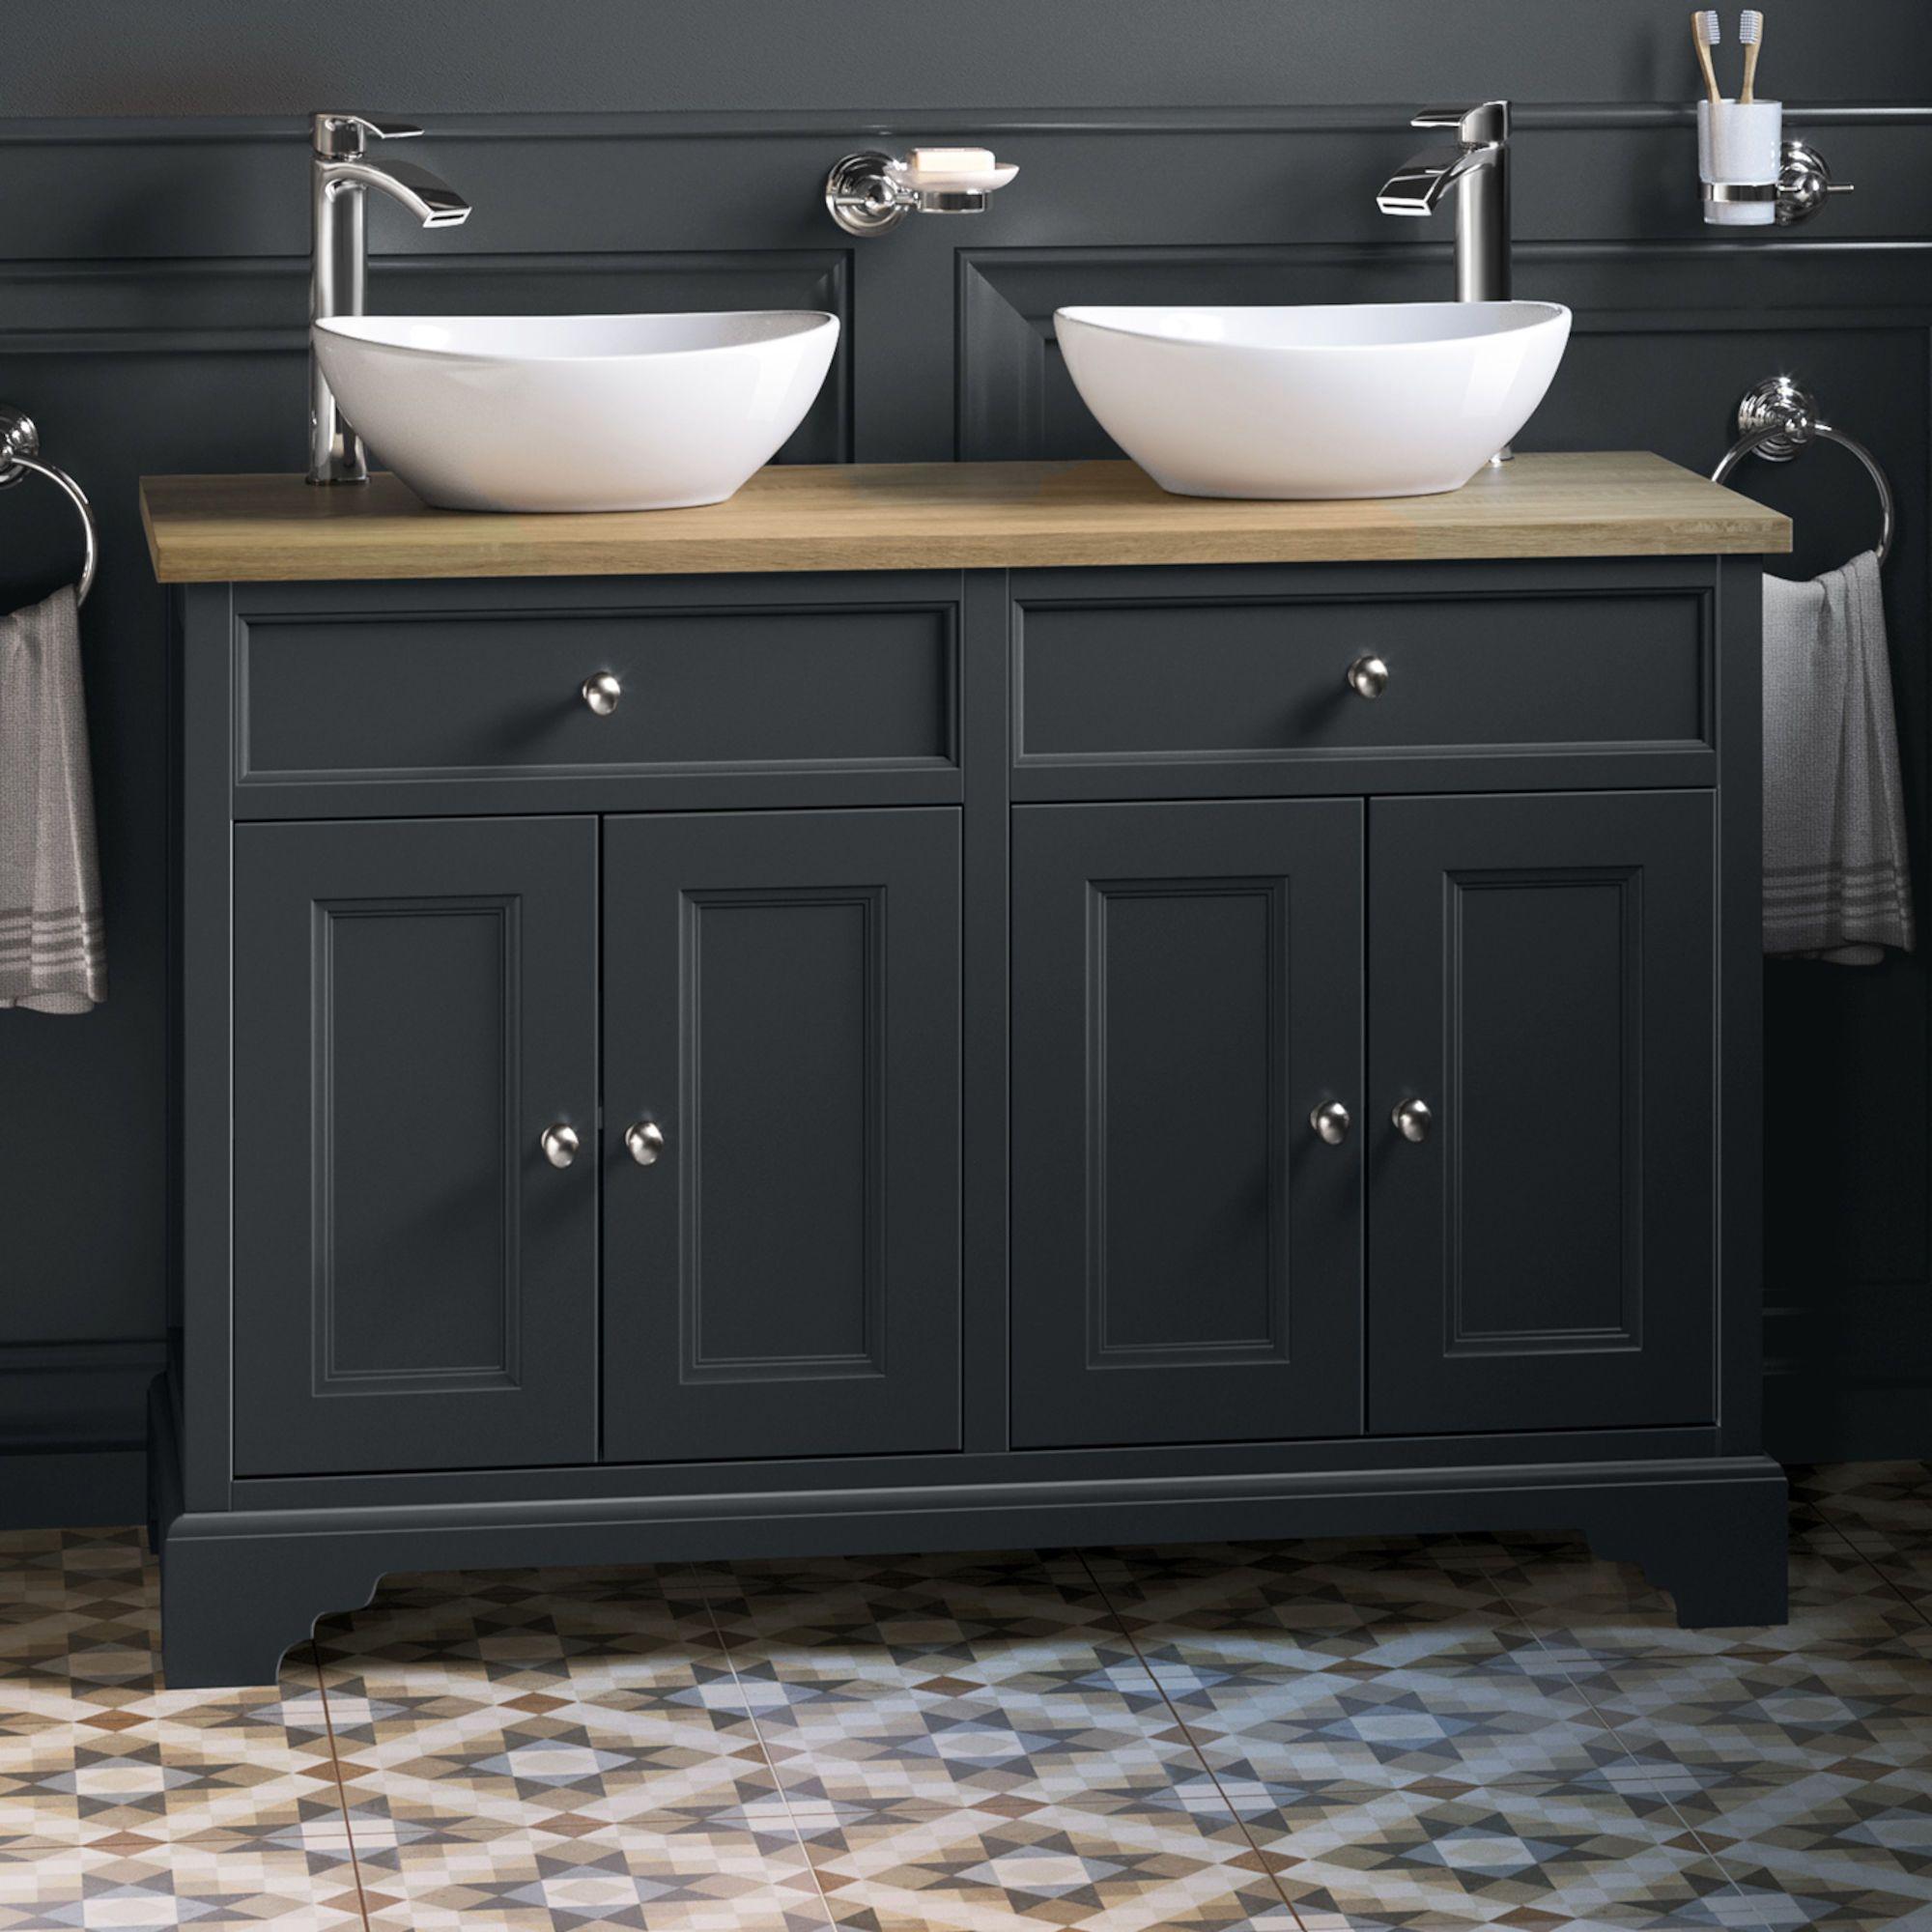 1200mm Loxley Charcoal Countertop Unit Double Camila Basin Floor Standing Soak Com Double Vanity Bathroom Double Vanity Unit